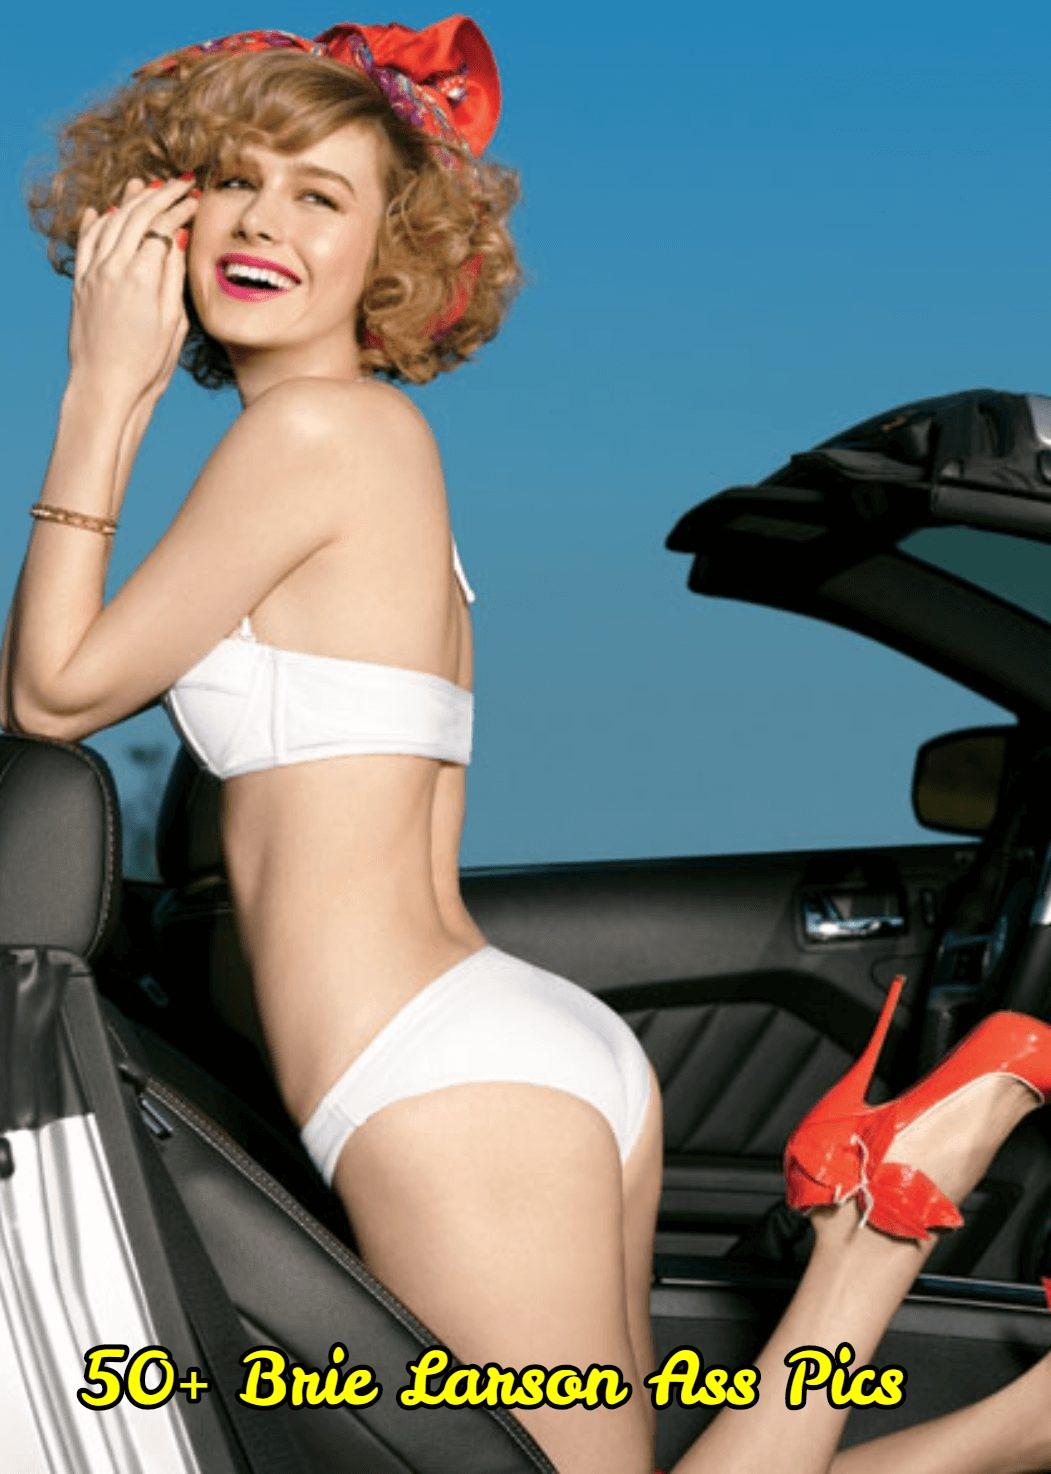 Brie Larson ass pics